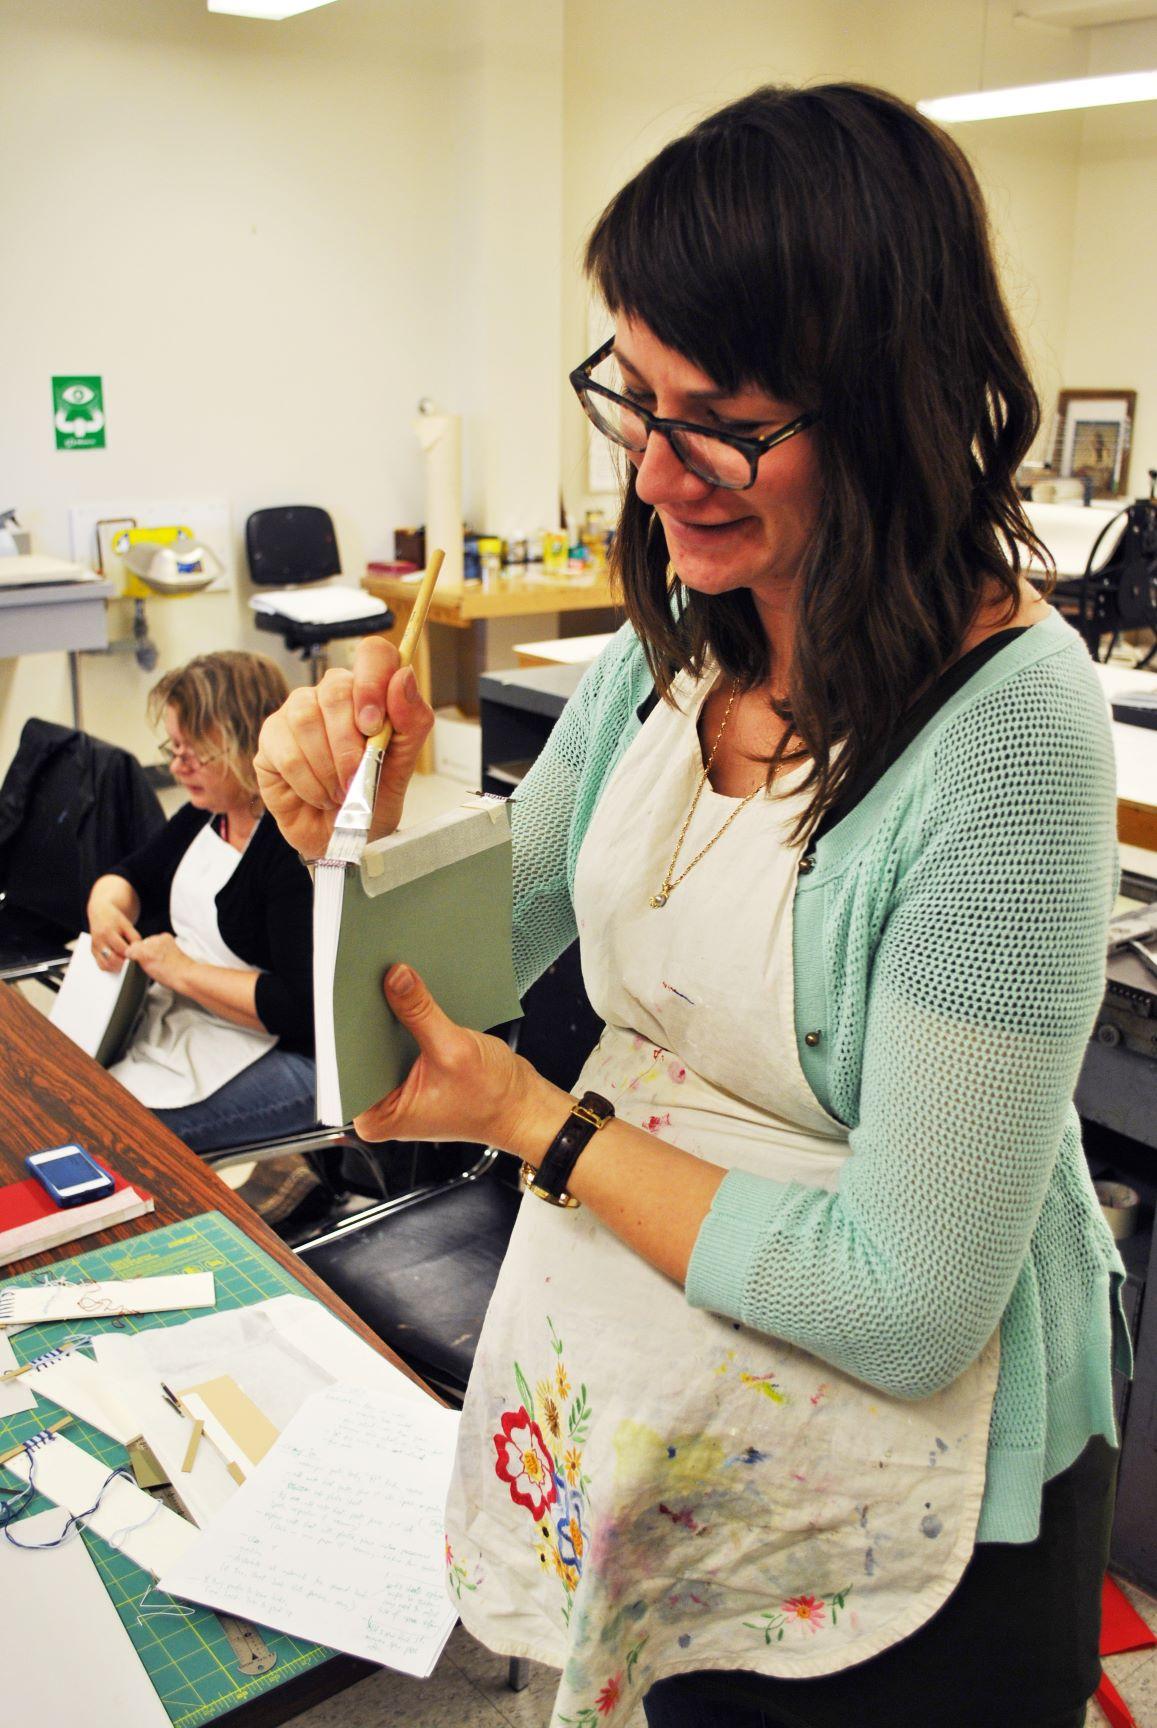 woman binding book with glue